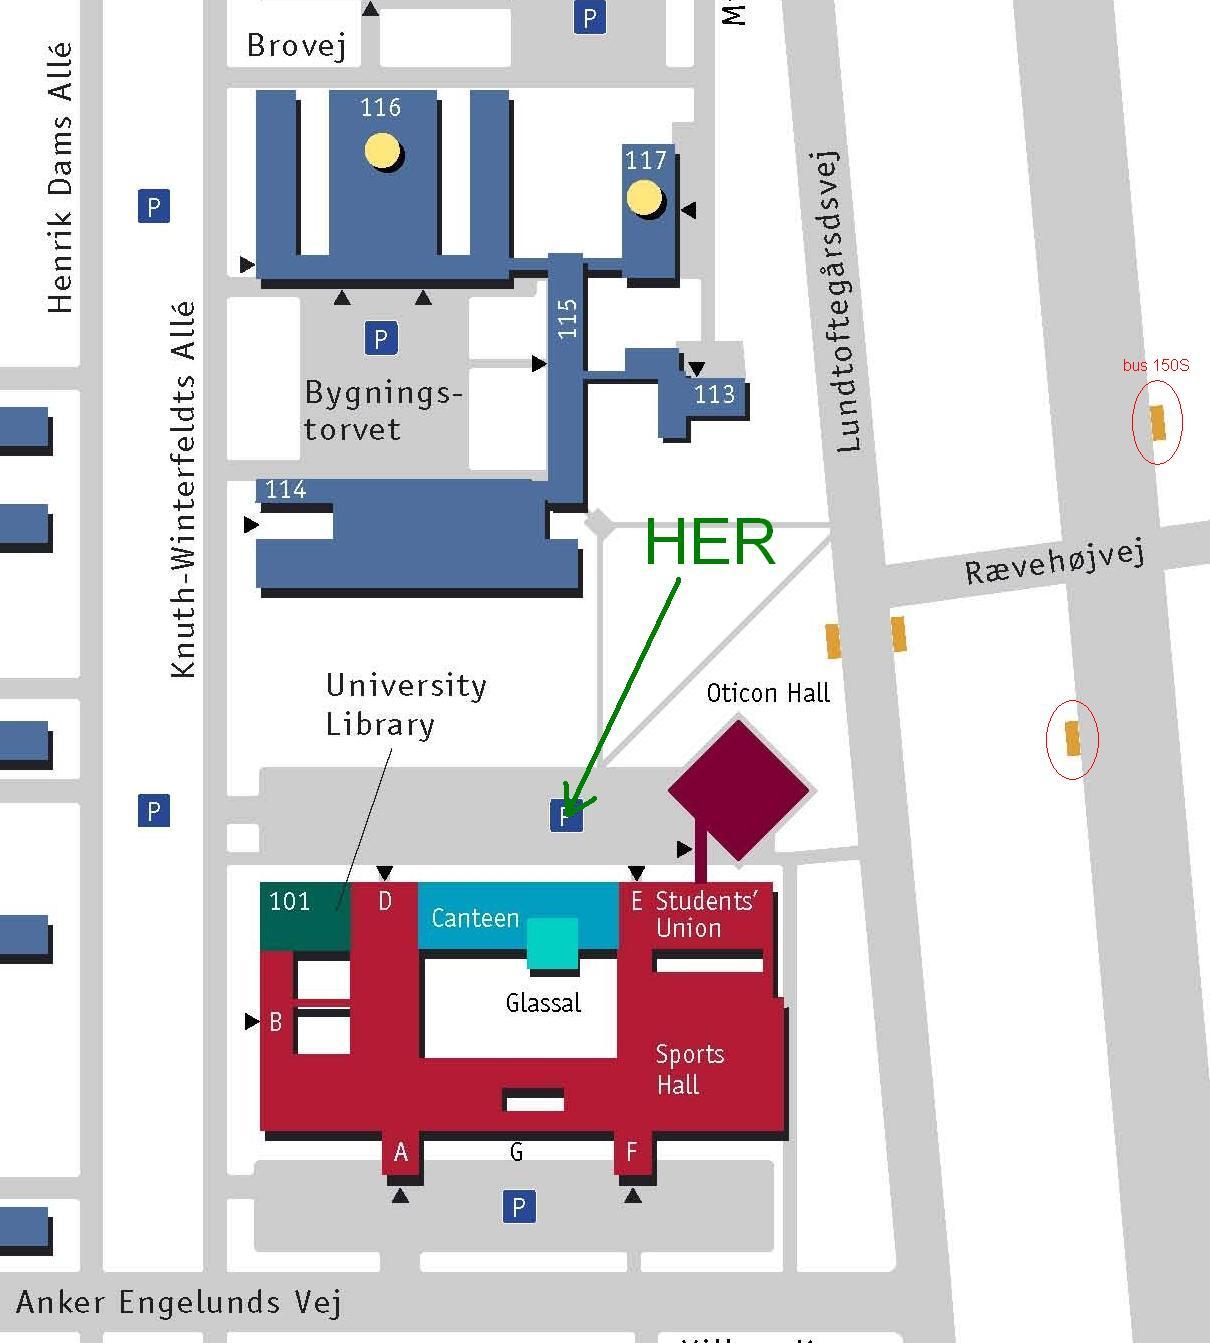 Vej Til Dtu 101 Meeting Room M1 I Kongens Lyngby Med Bus Eller